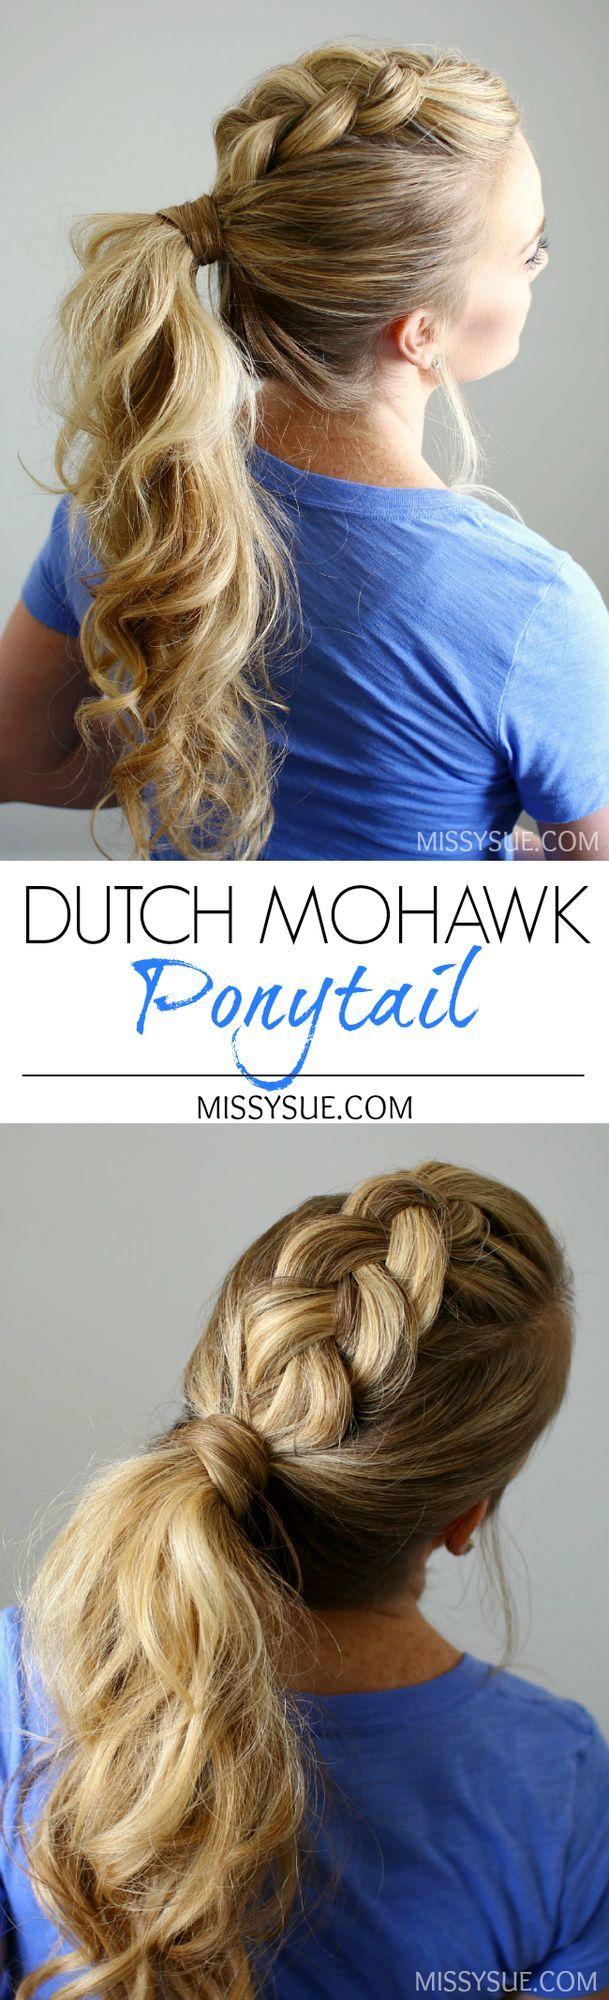 dutch braids ideas